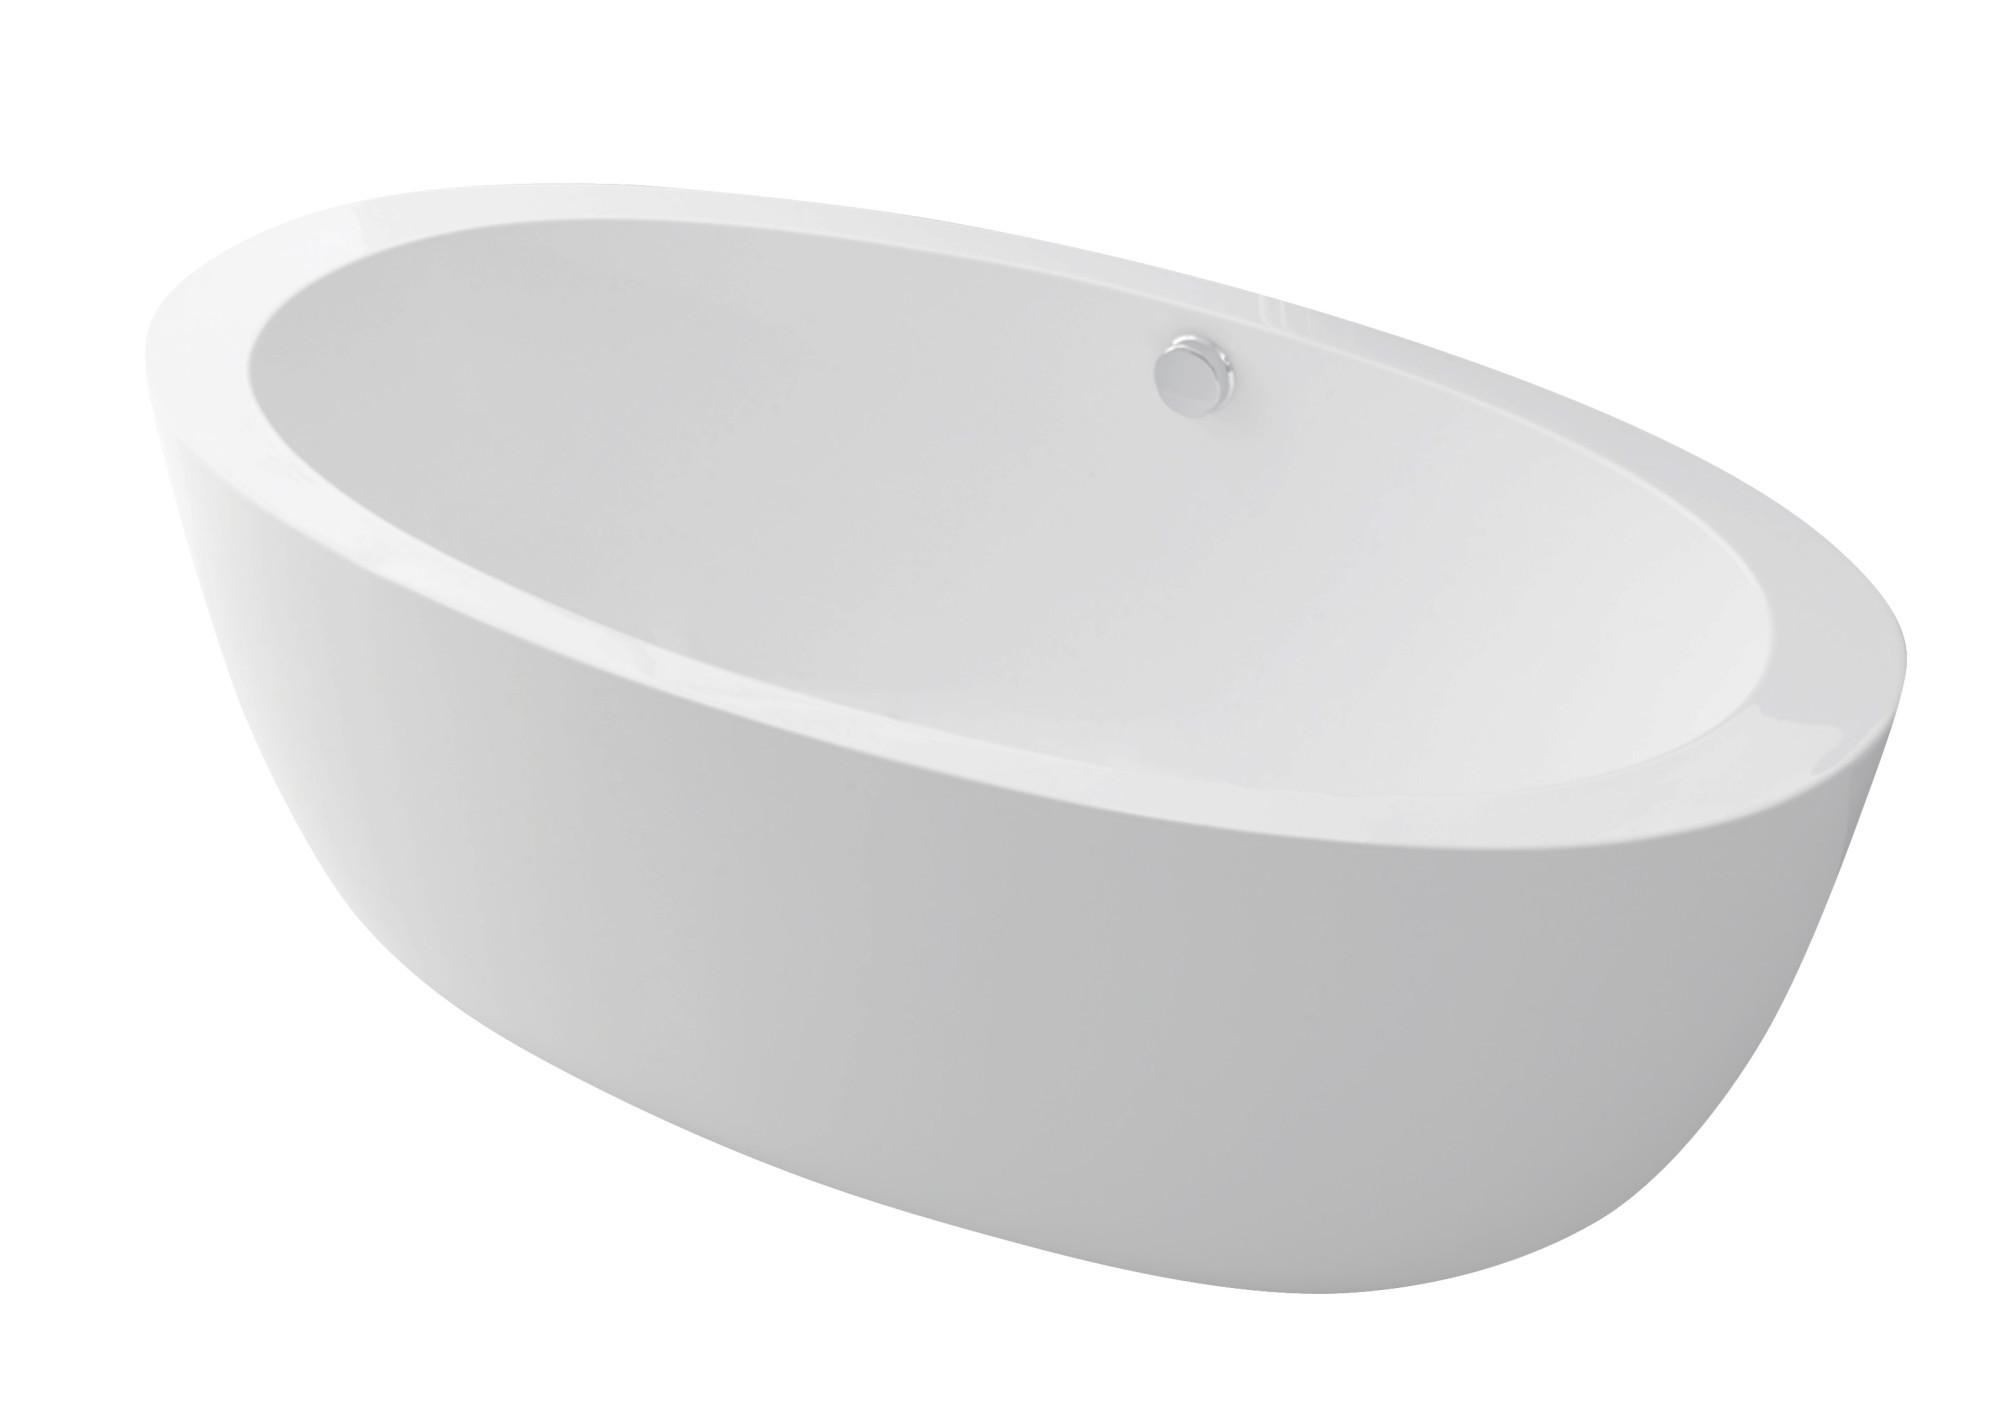 Anzzi FT-AZ111 Yield Series 5.58 ft. Freestanding Bathtub in White